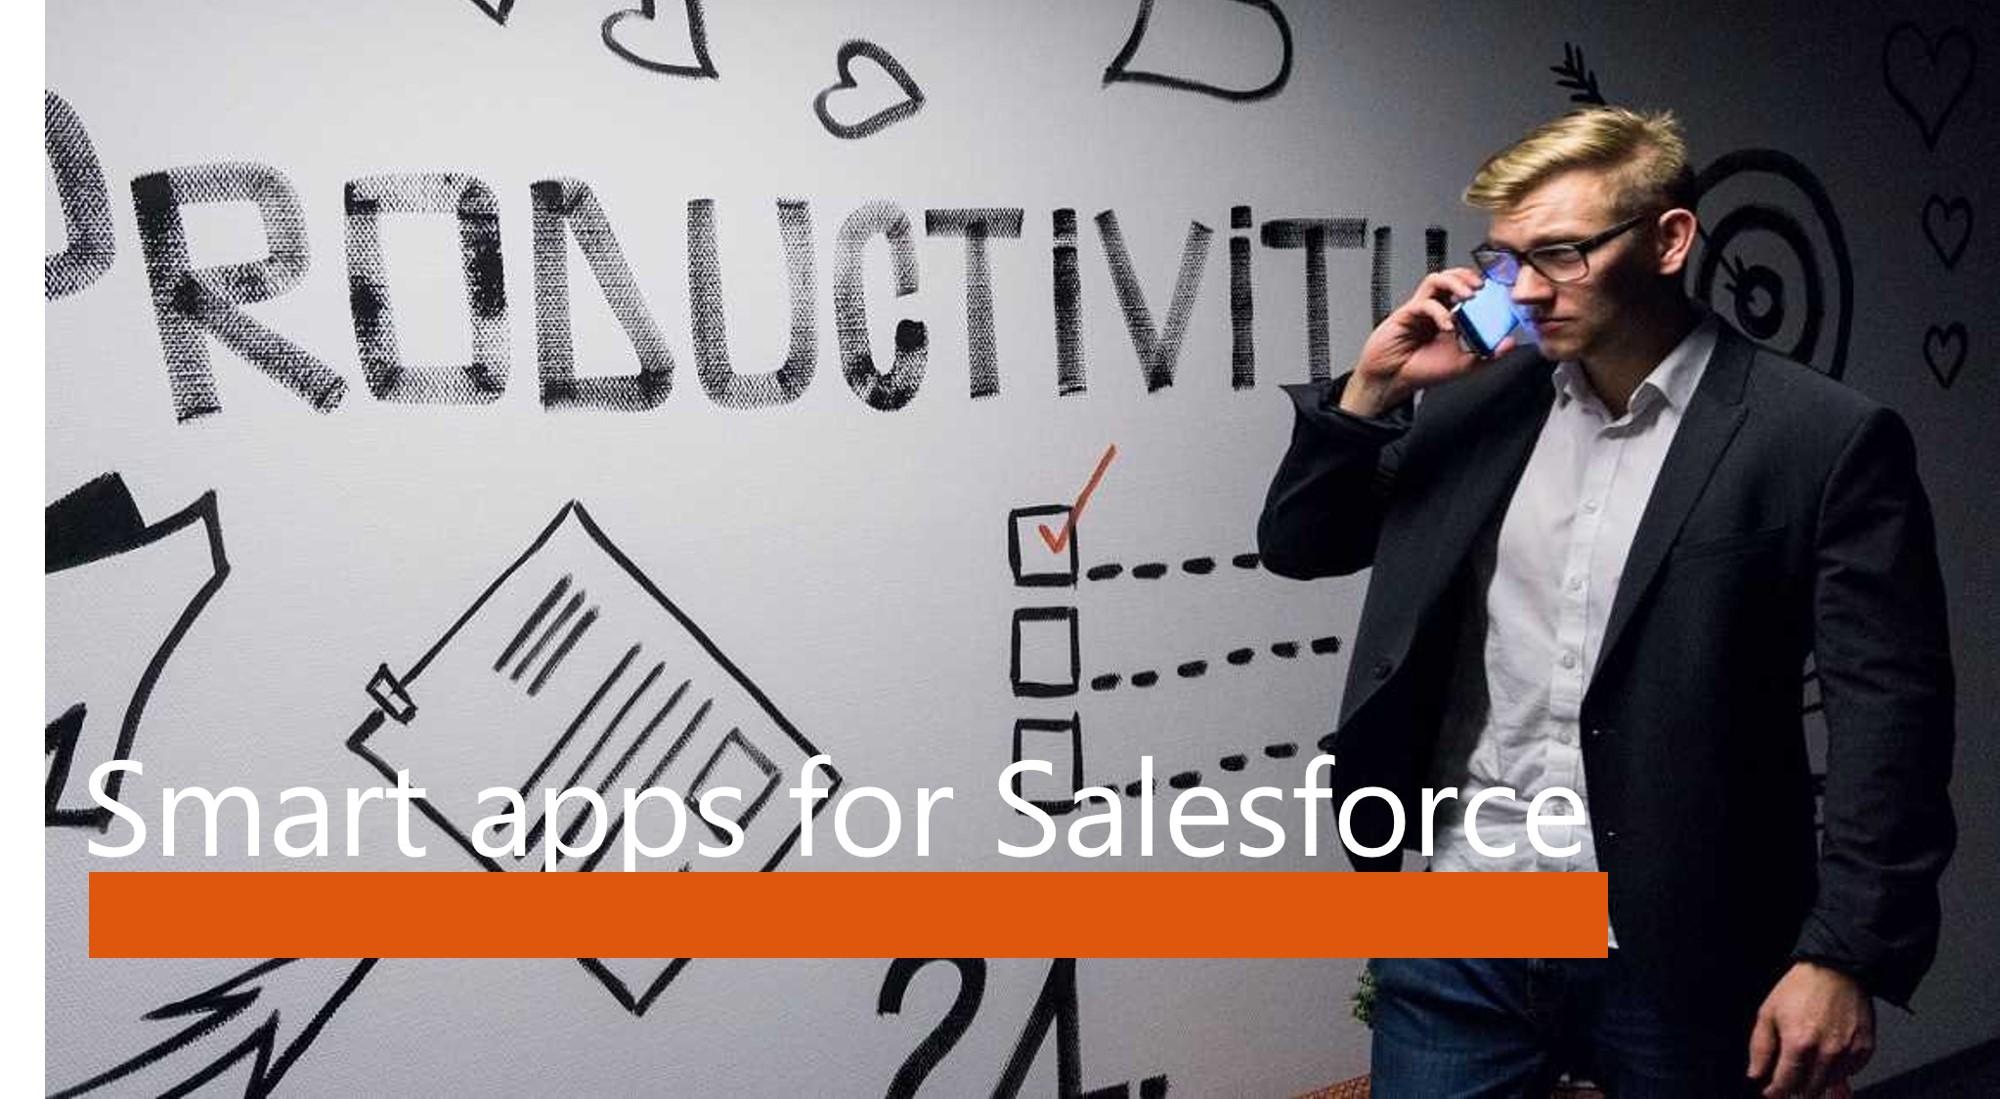 Smart apps for Salesforce